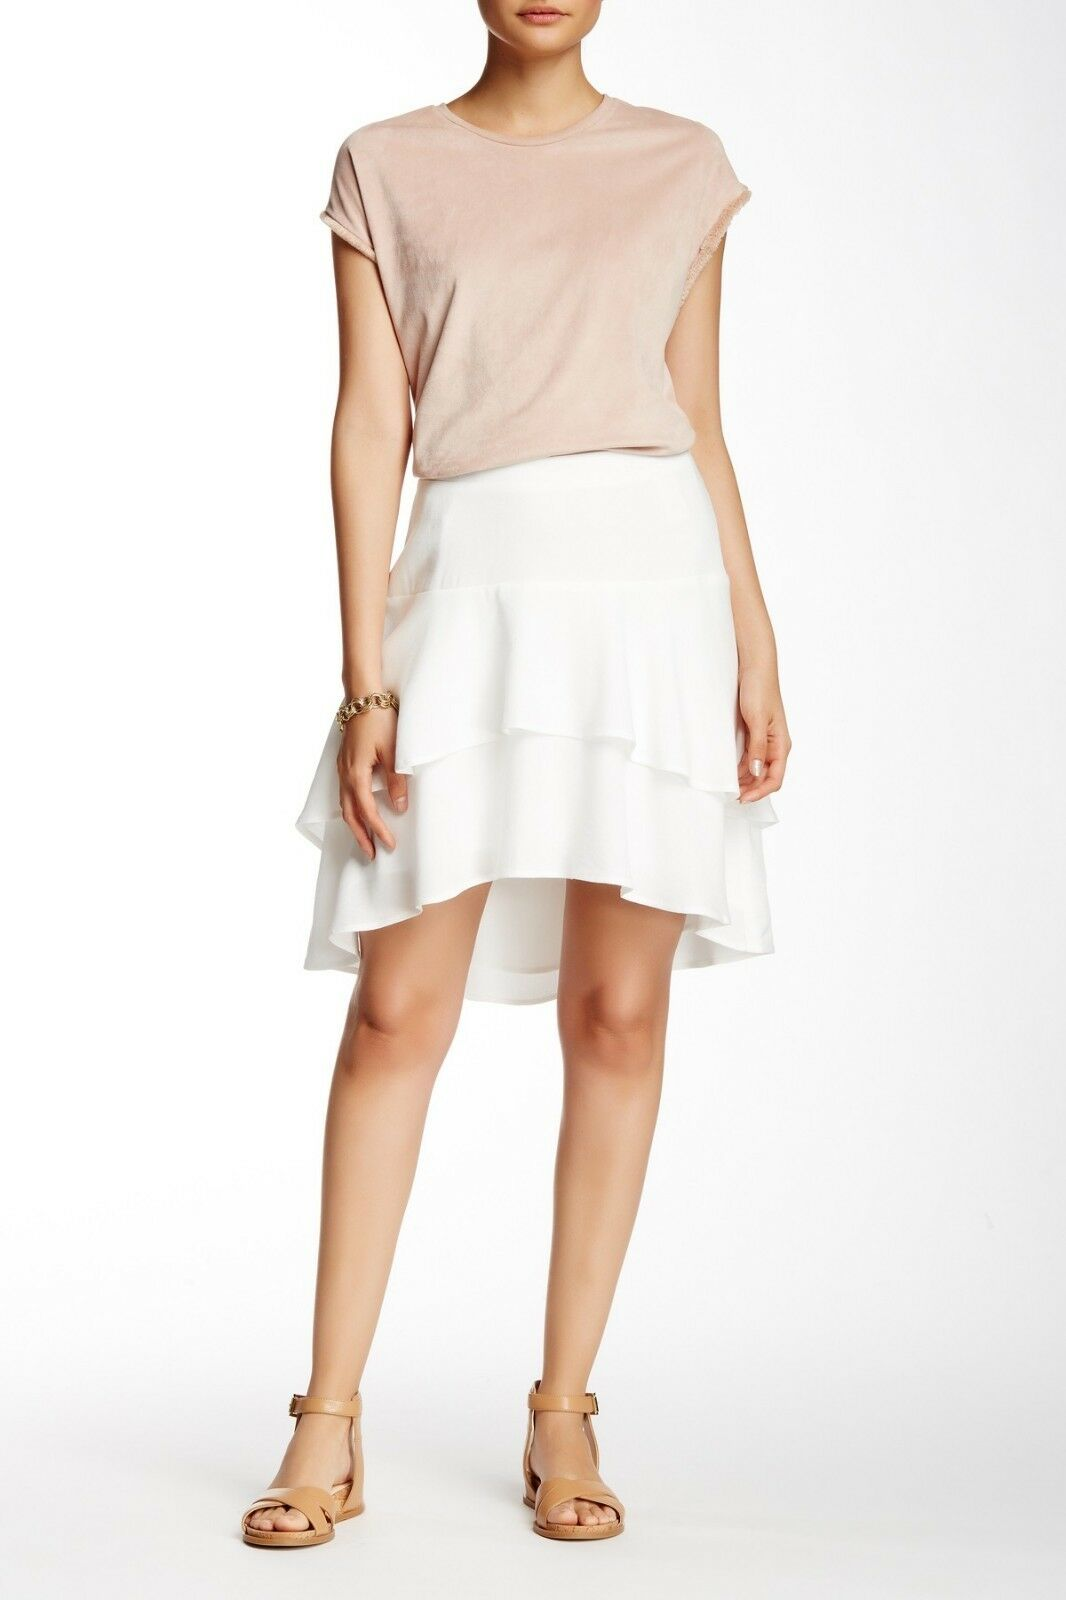 Ella Moss Tired Hi-Lo Skirt WHITE SZ M RETAIL   158